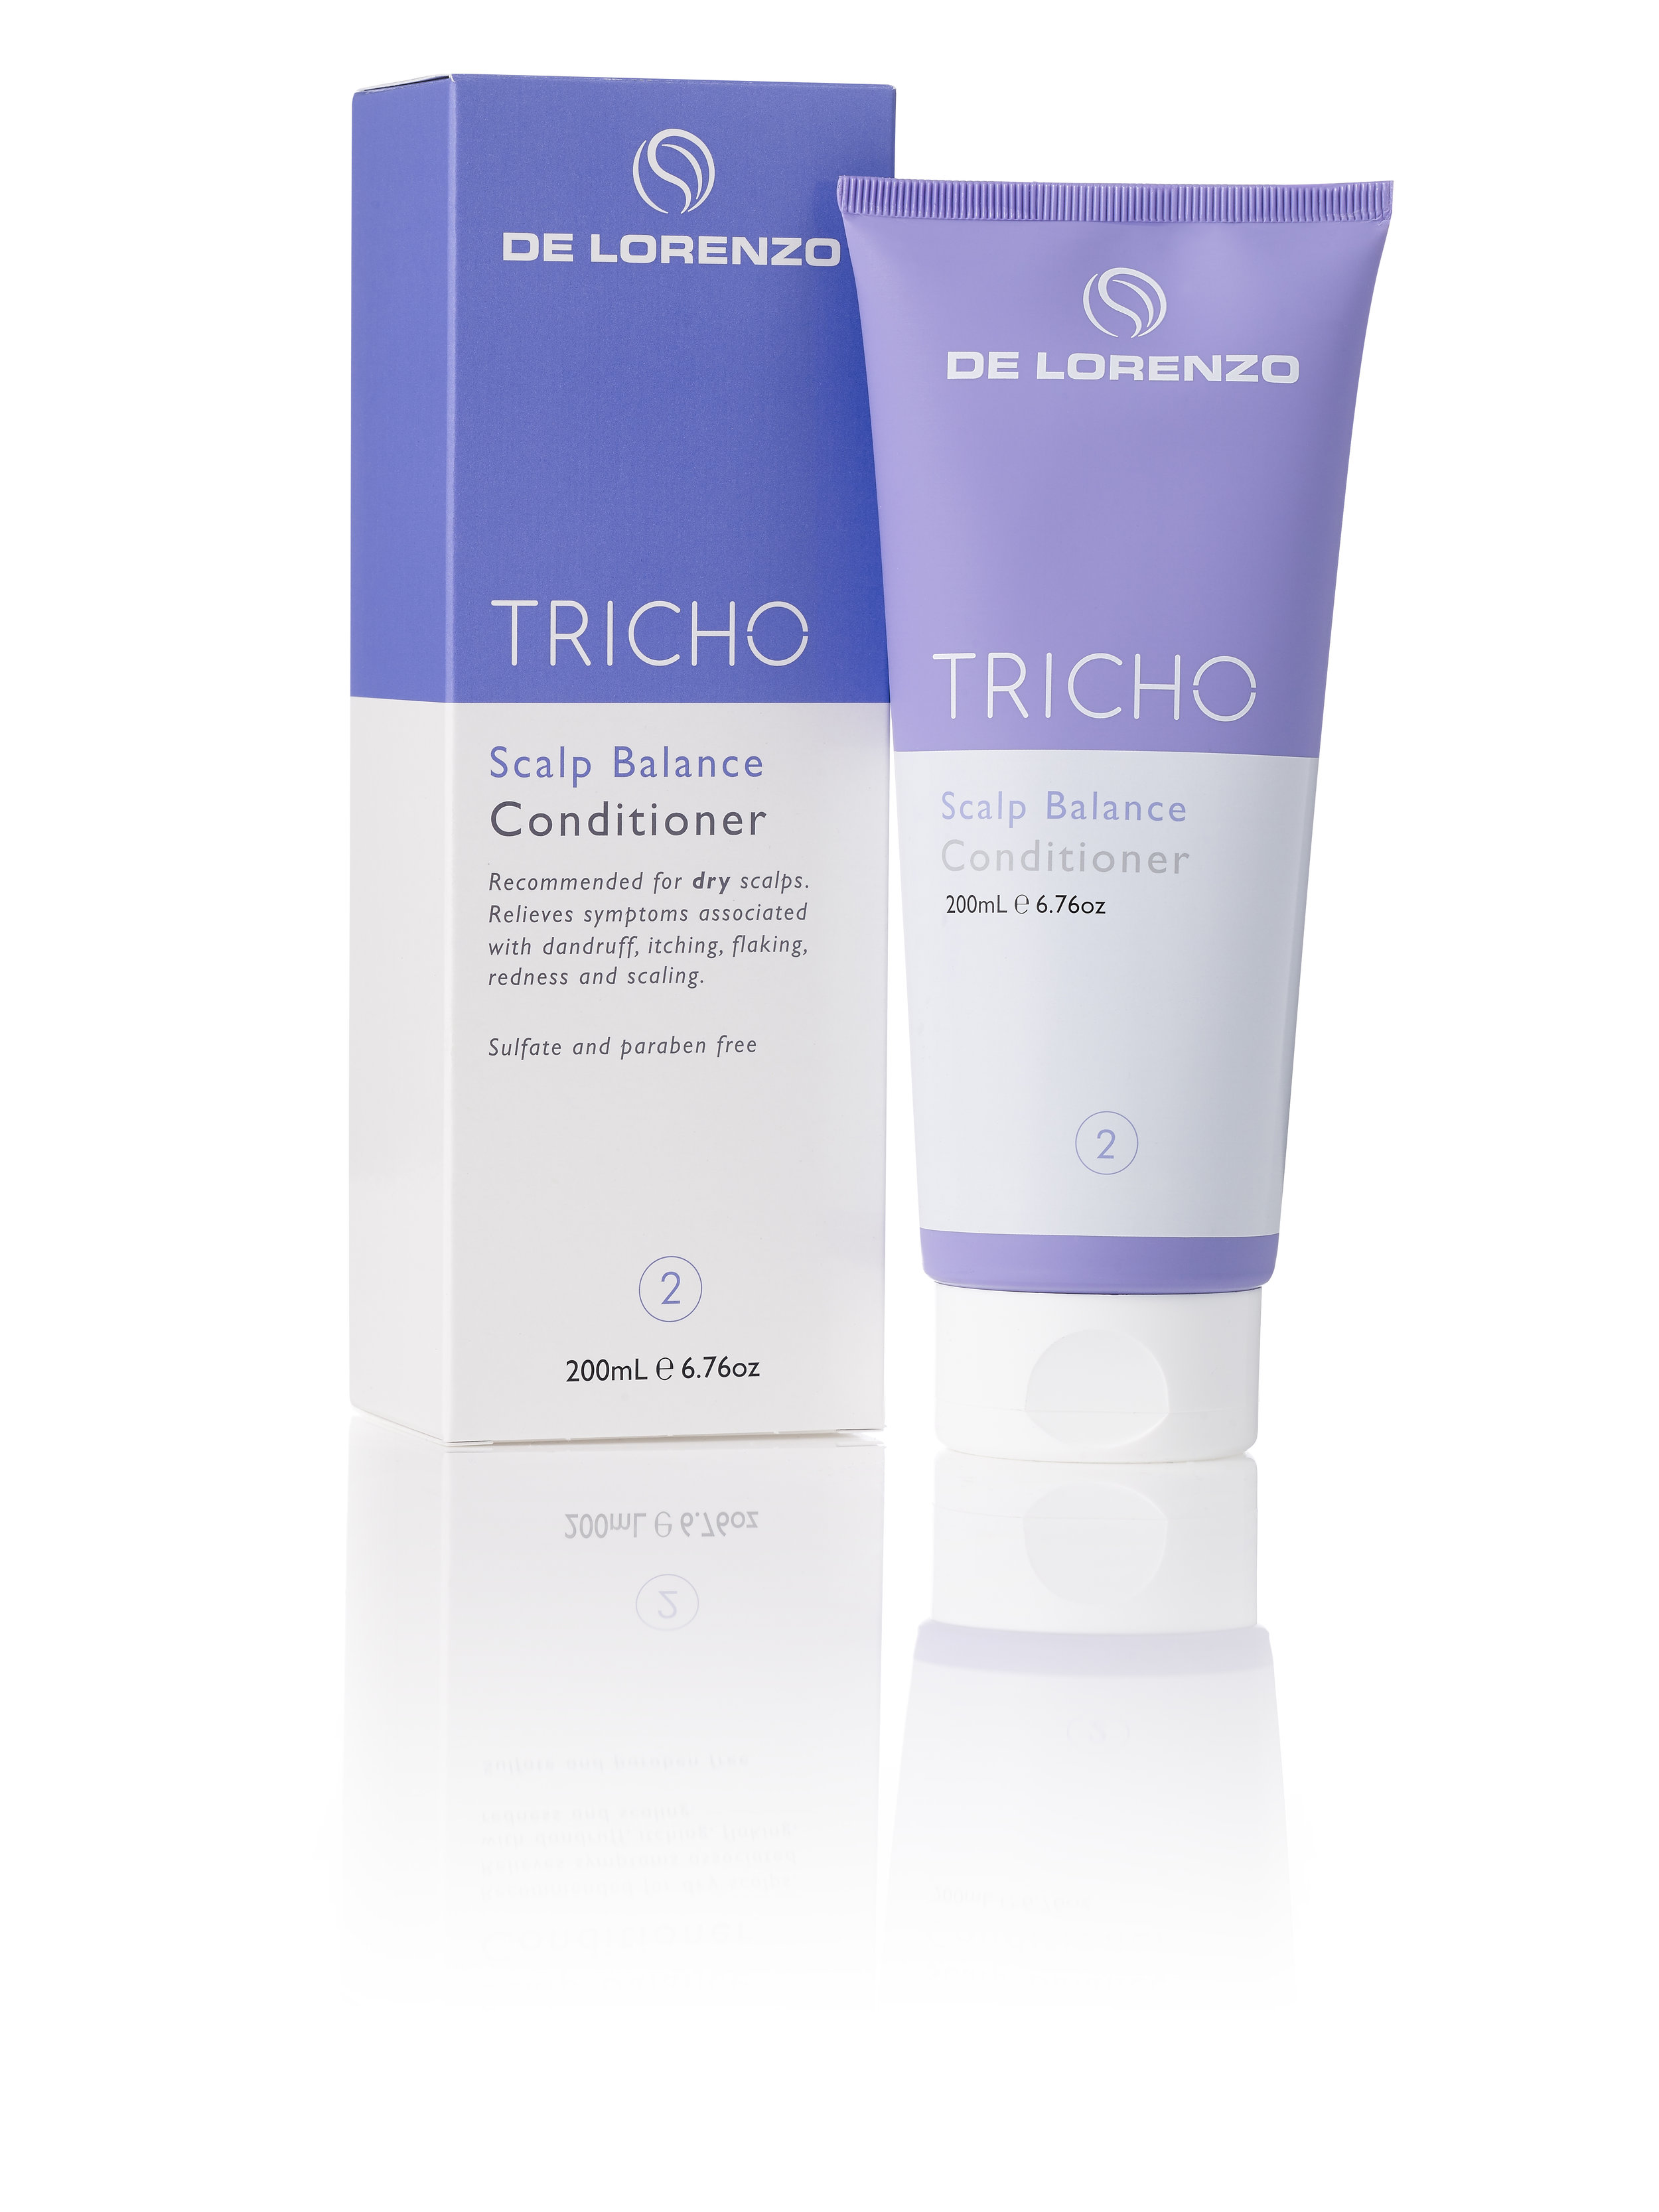 Tricho Scalp Balance_Conditioner_01.jpg